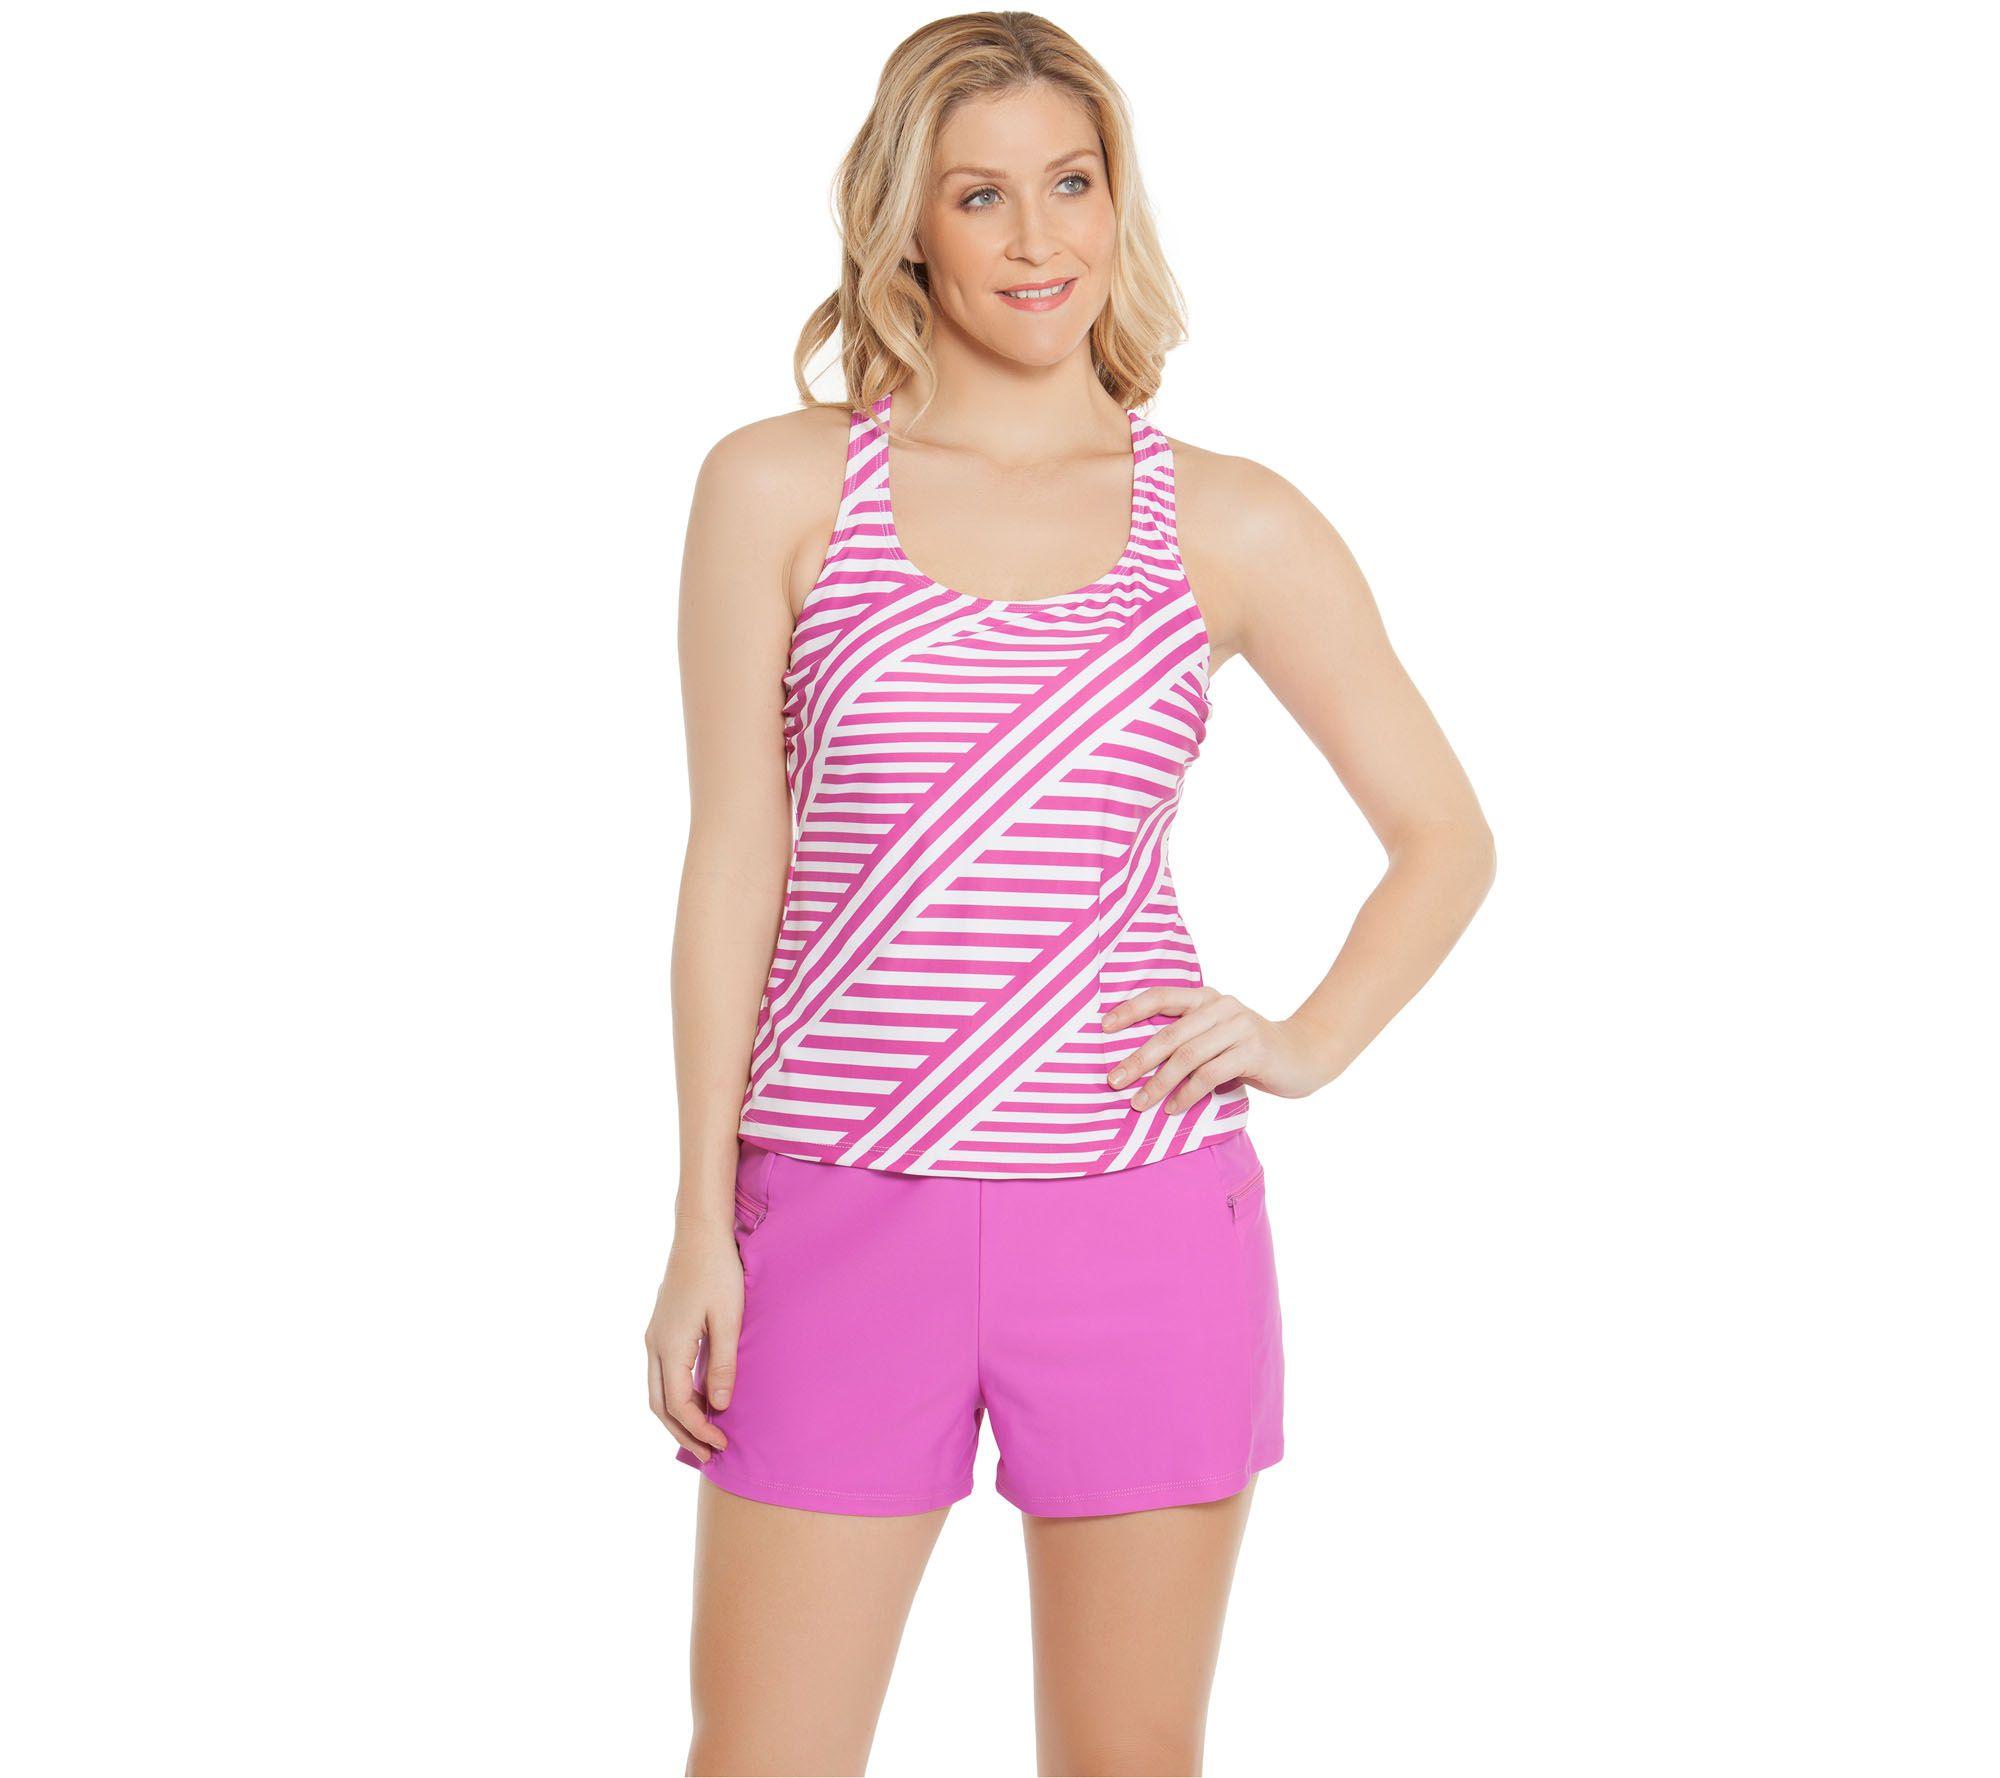 0baeb5c40a Ocean Dream Signature Stripe Play Tankini Swimsuit - Page 1 — QVC.com